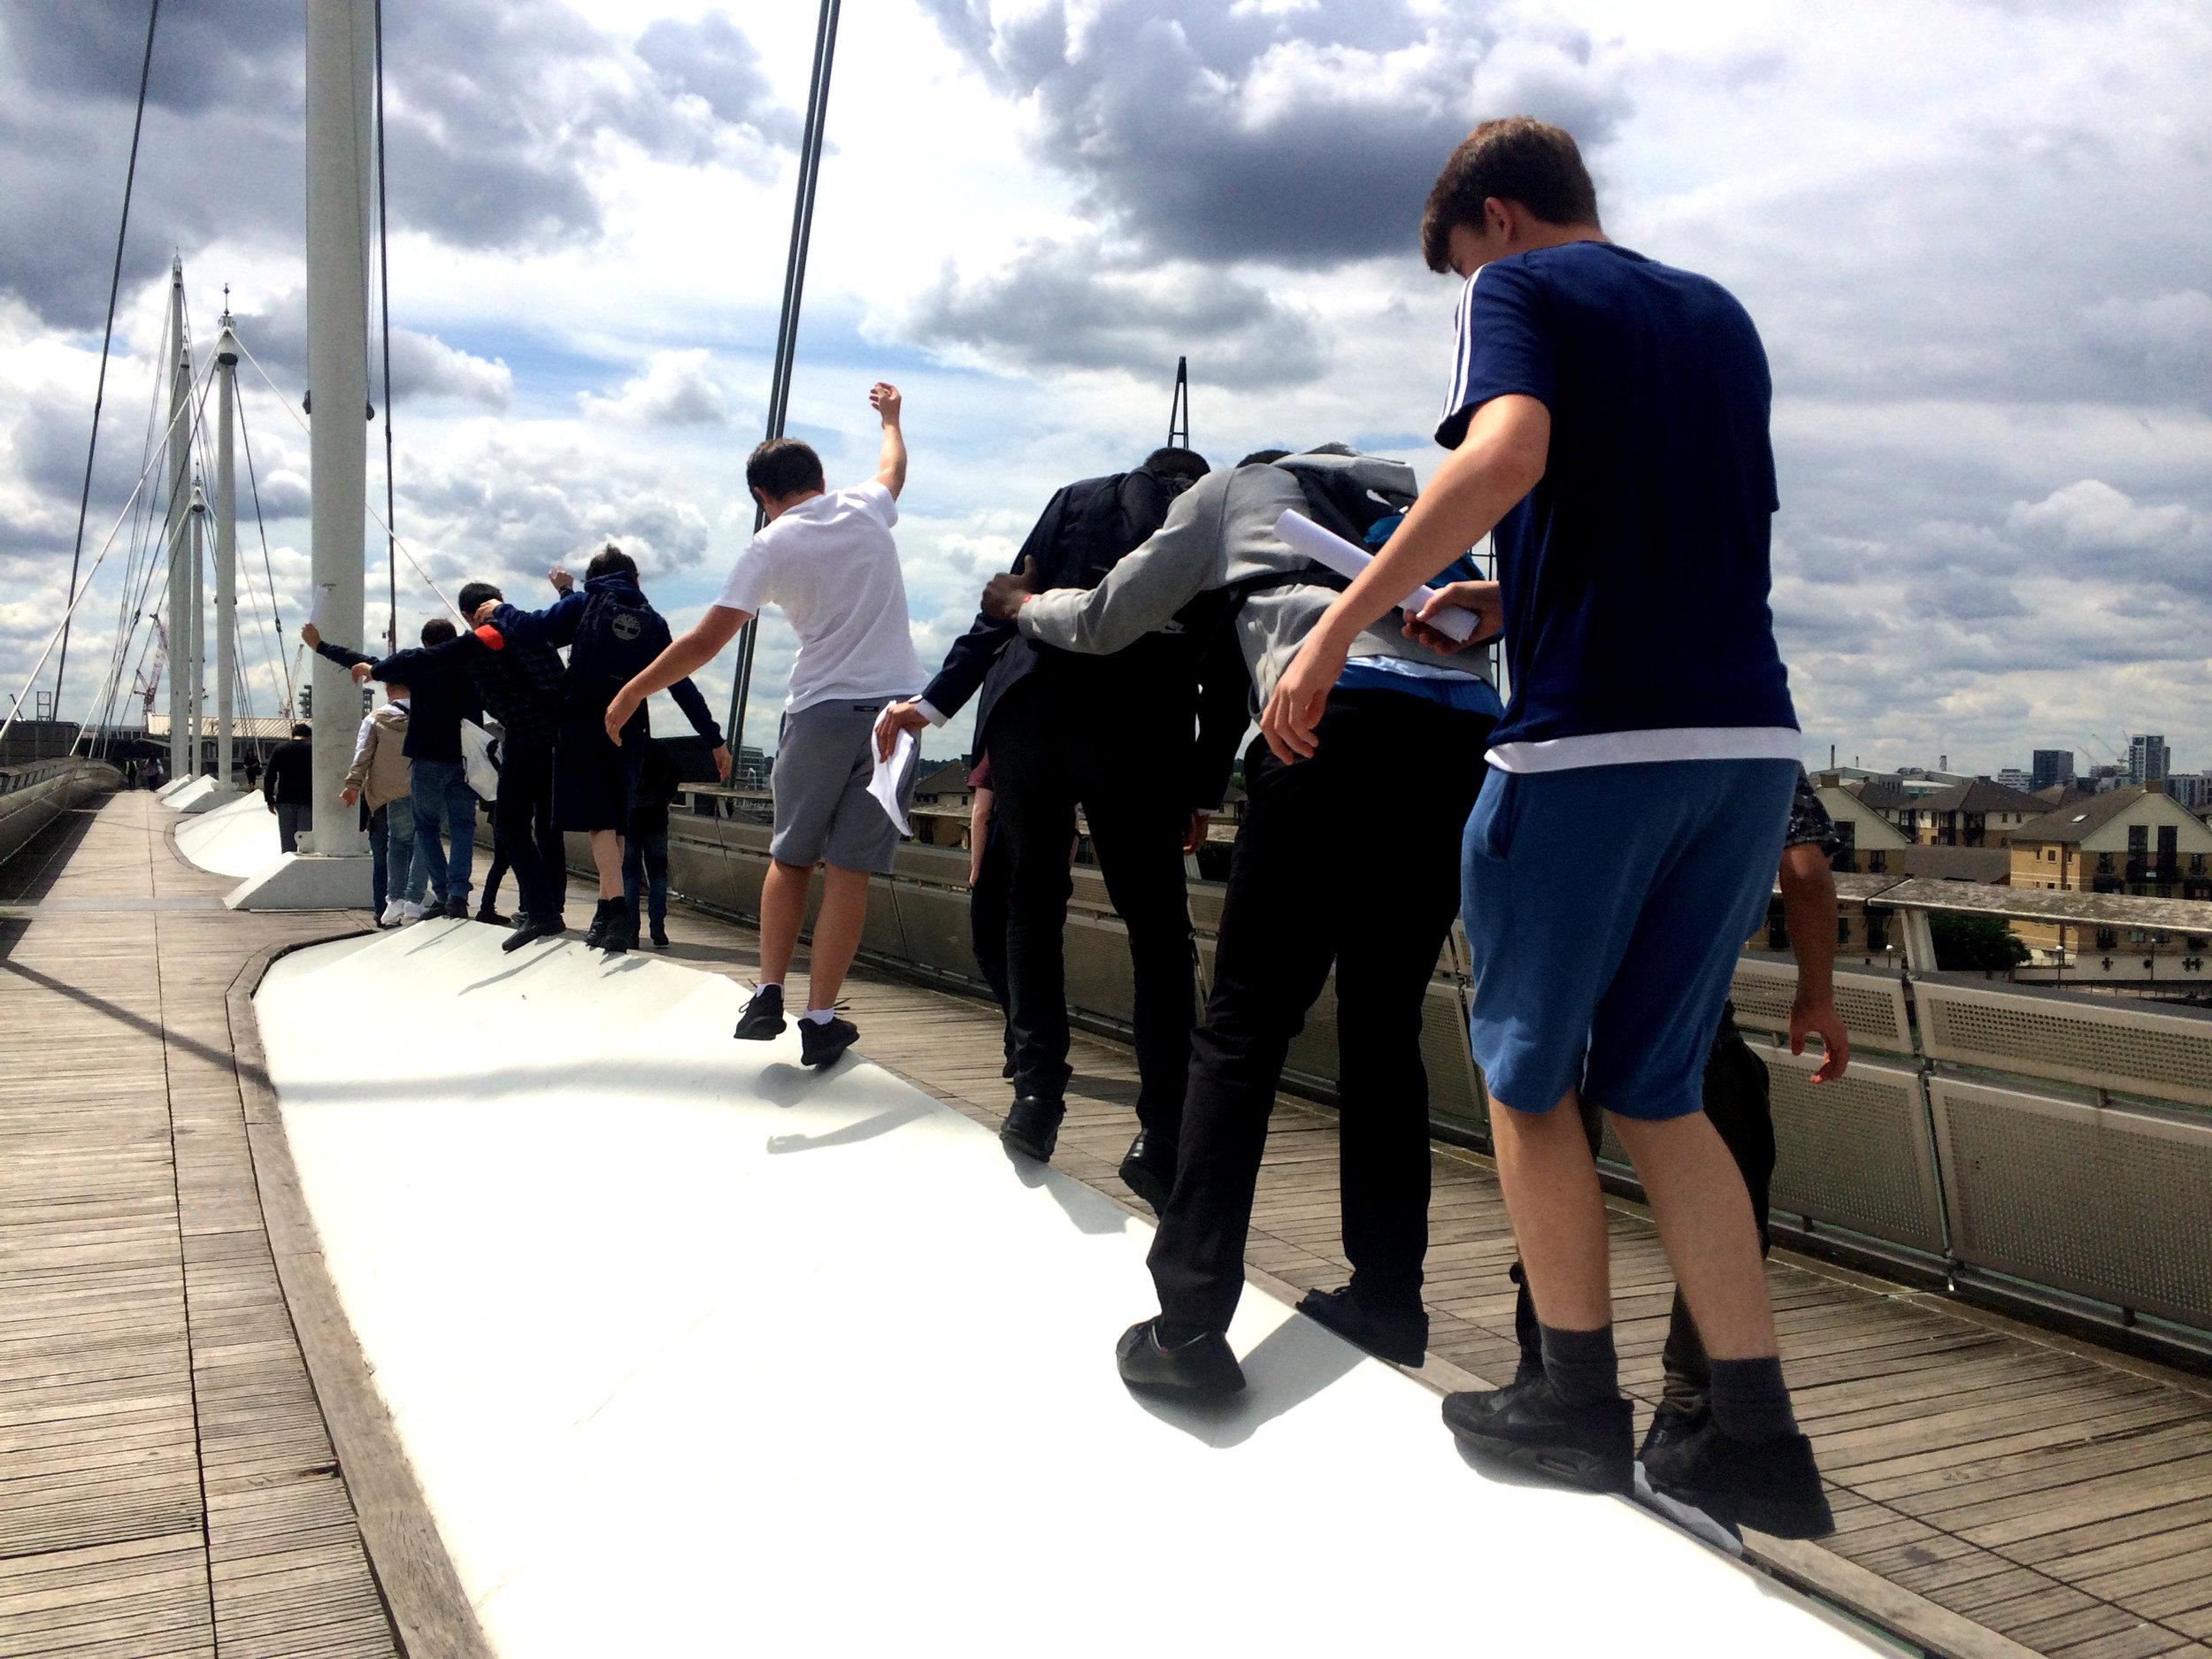 Balancing on the bridge